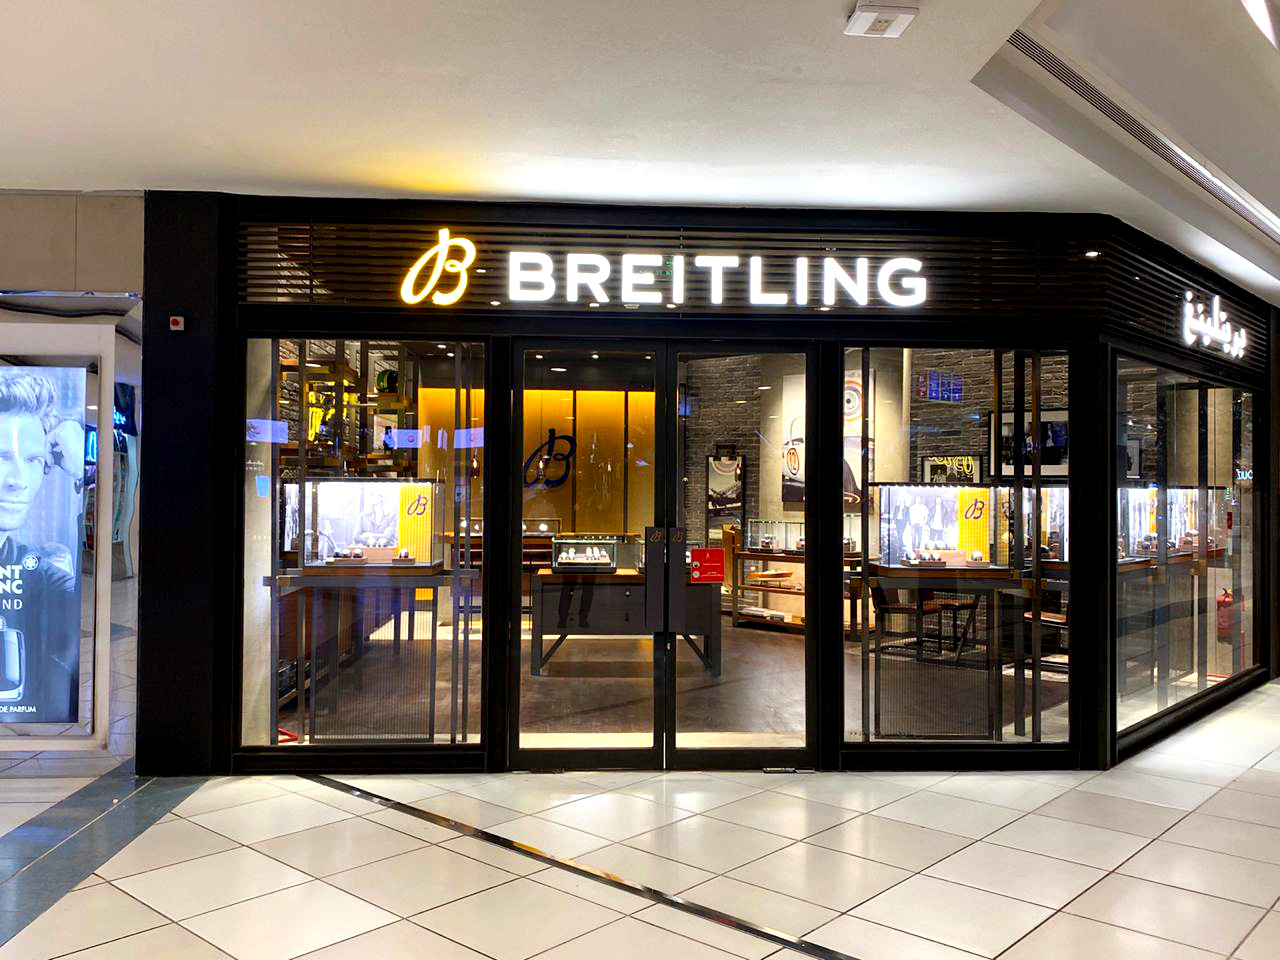 بريتلينغ gallery